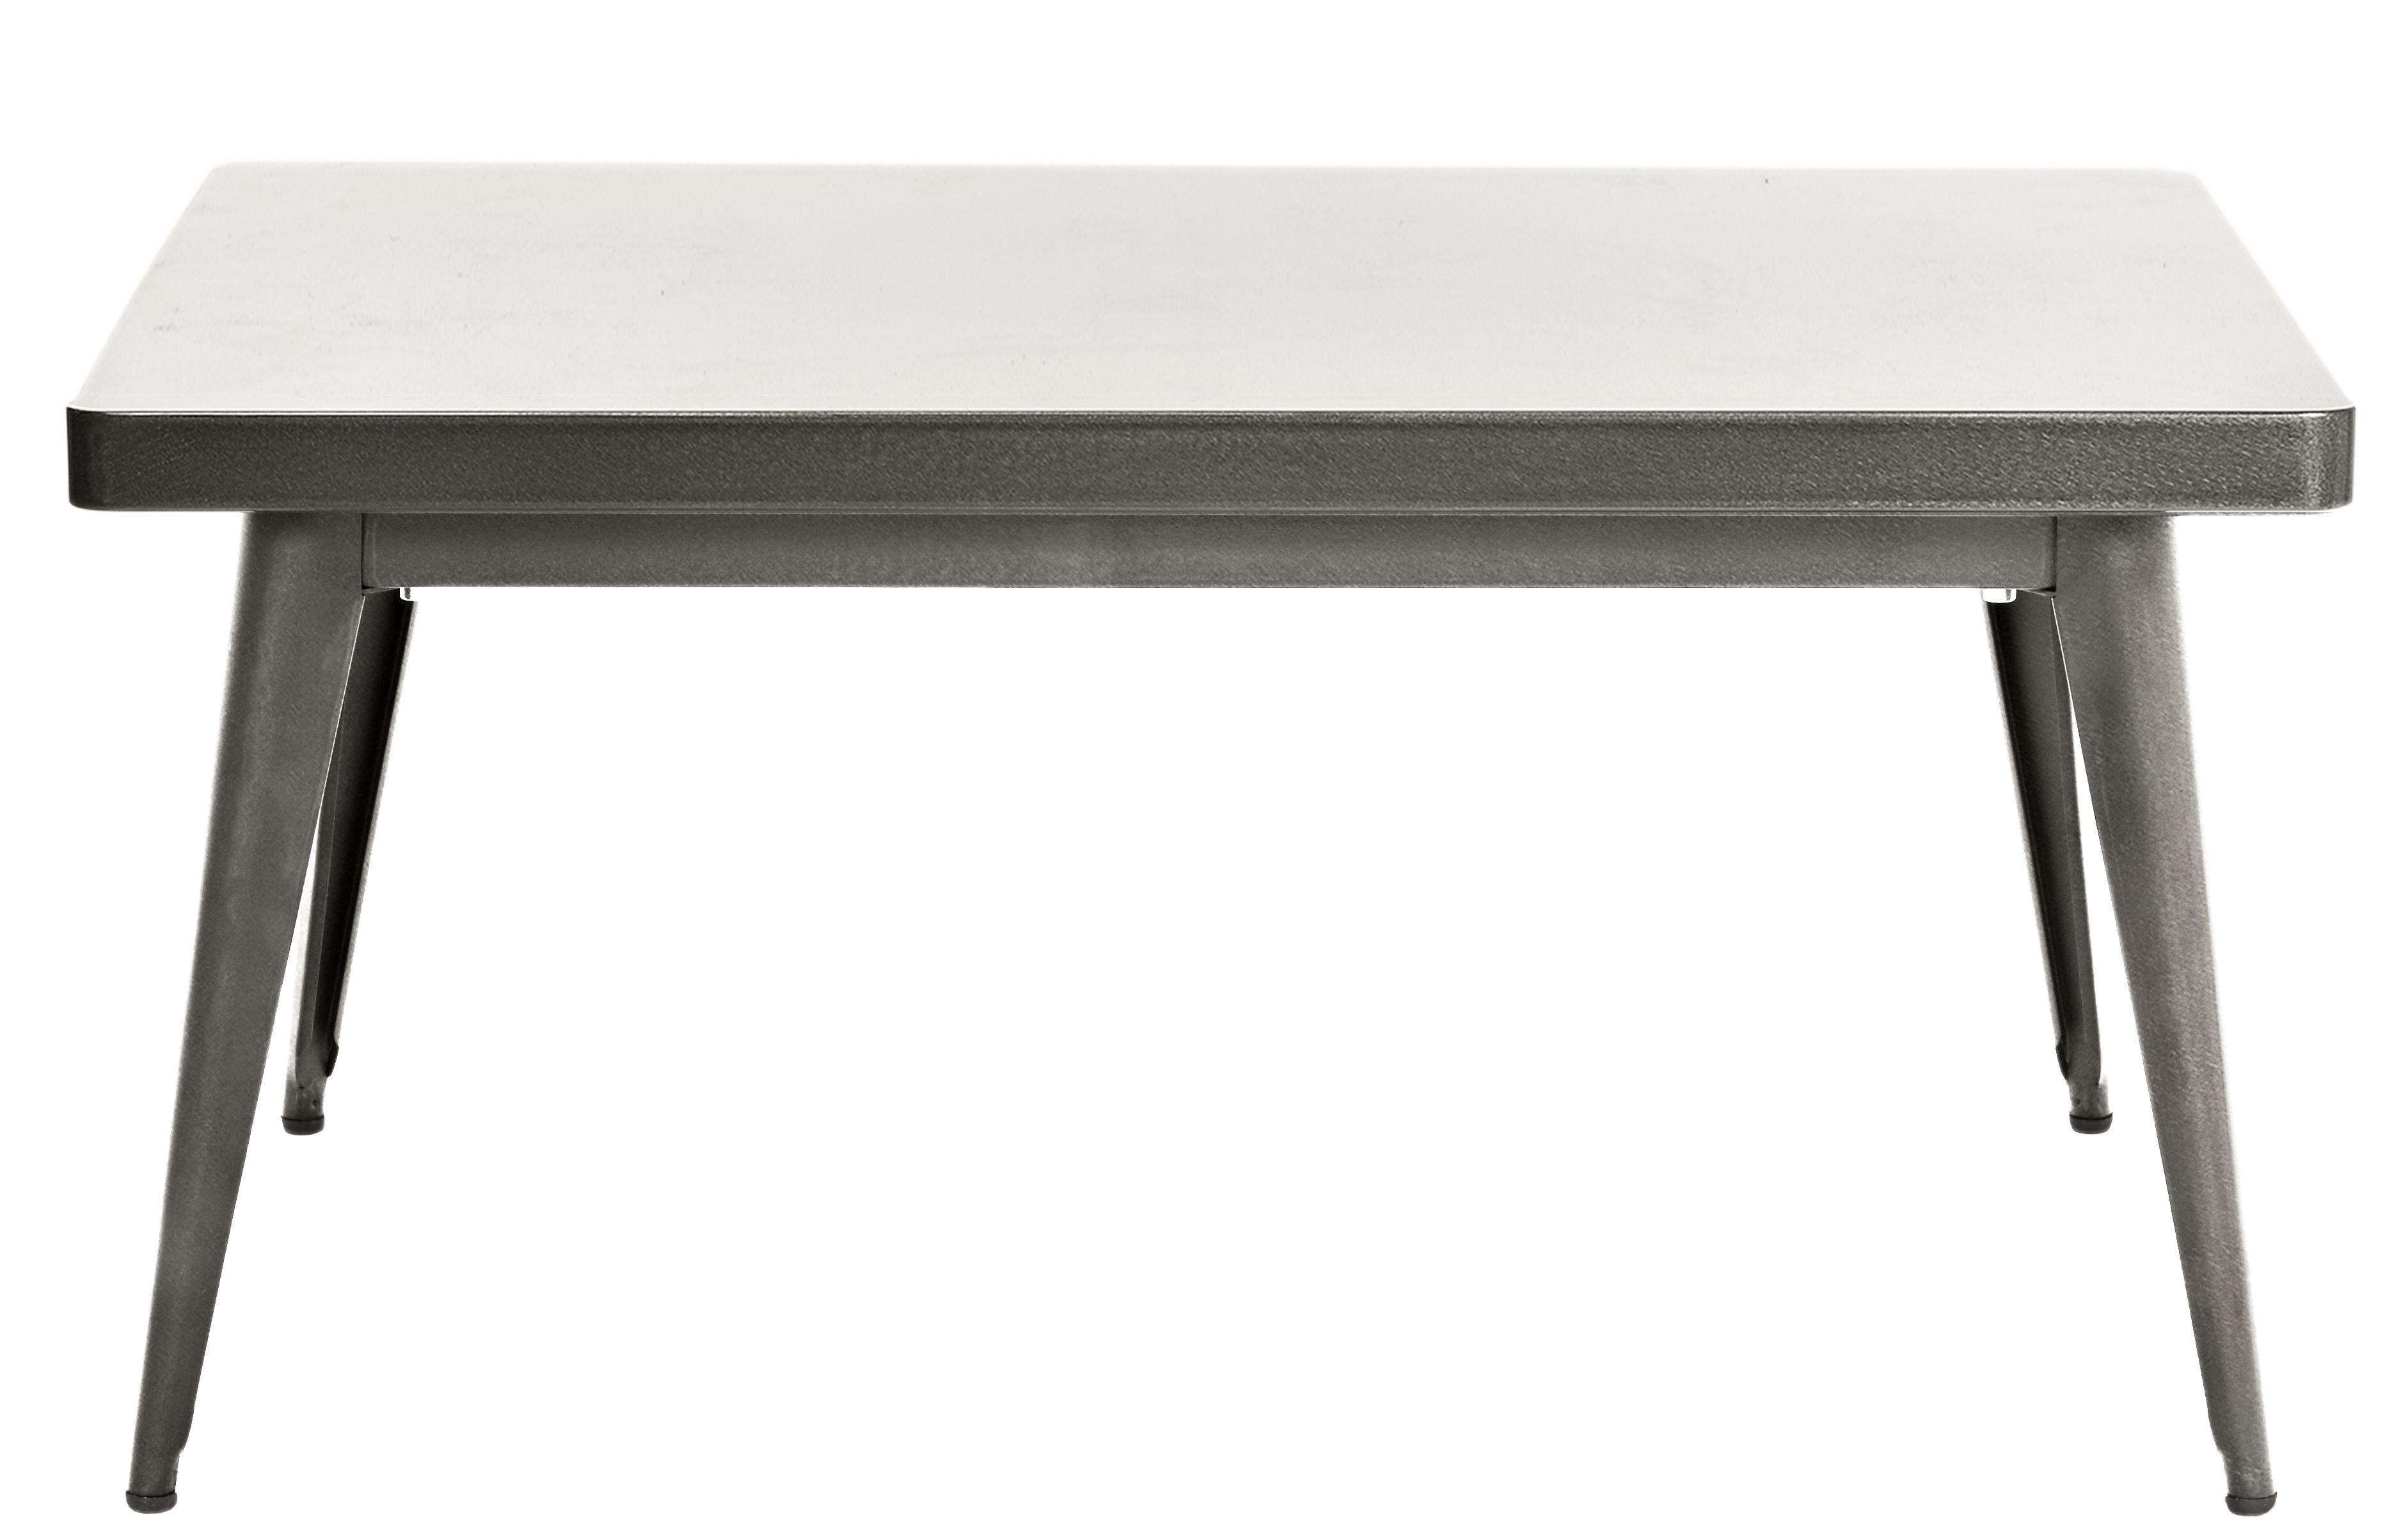 table basse 55 90 x 55 cm acier brut verni brillant tolix. Black Bedroom Furniture Sets. Home Design Ideas